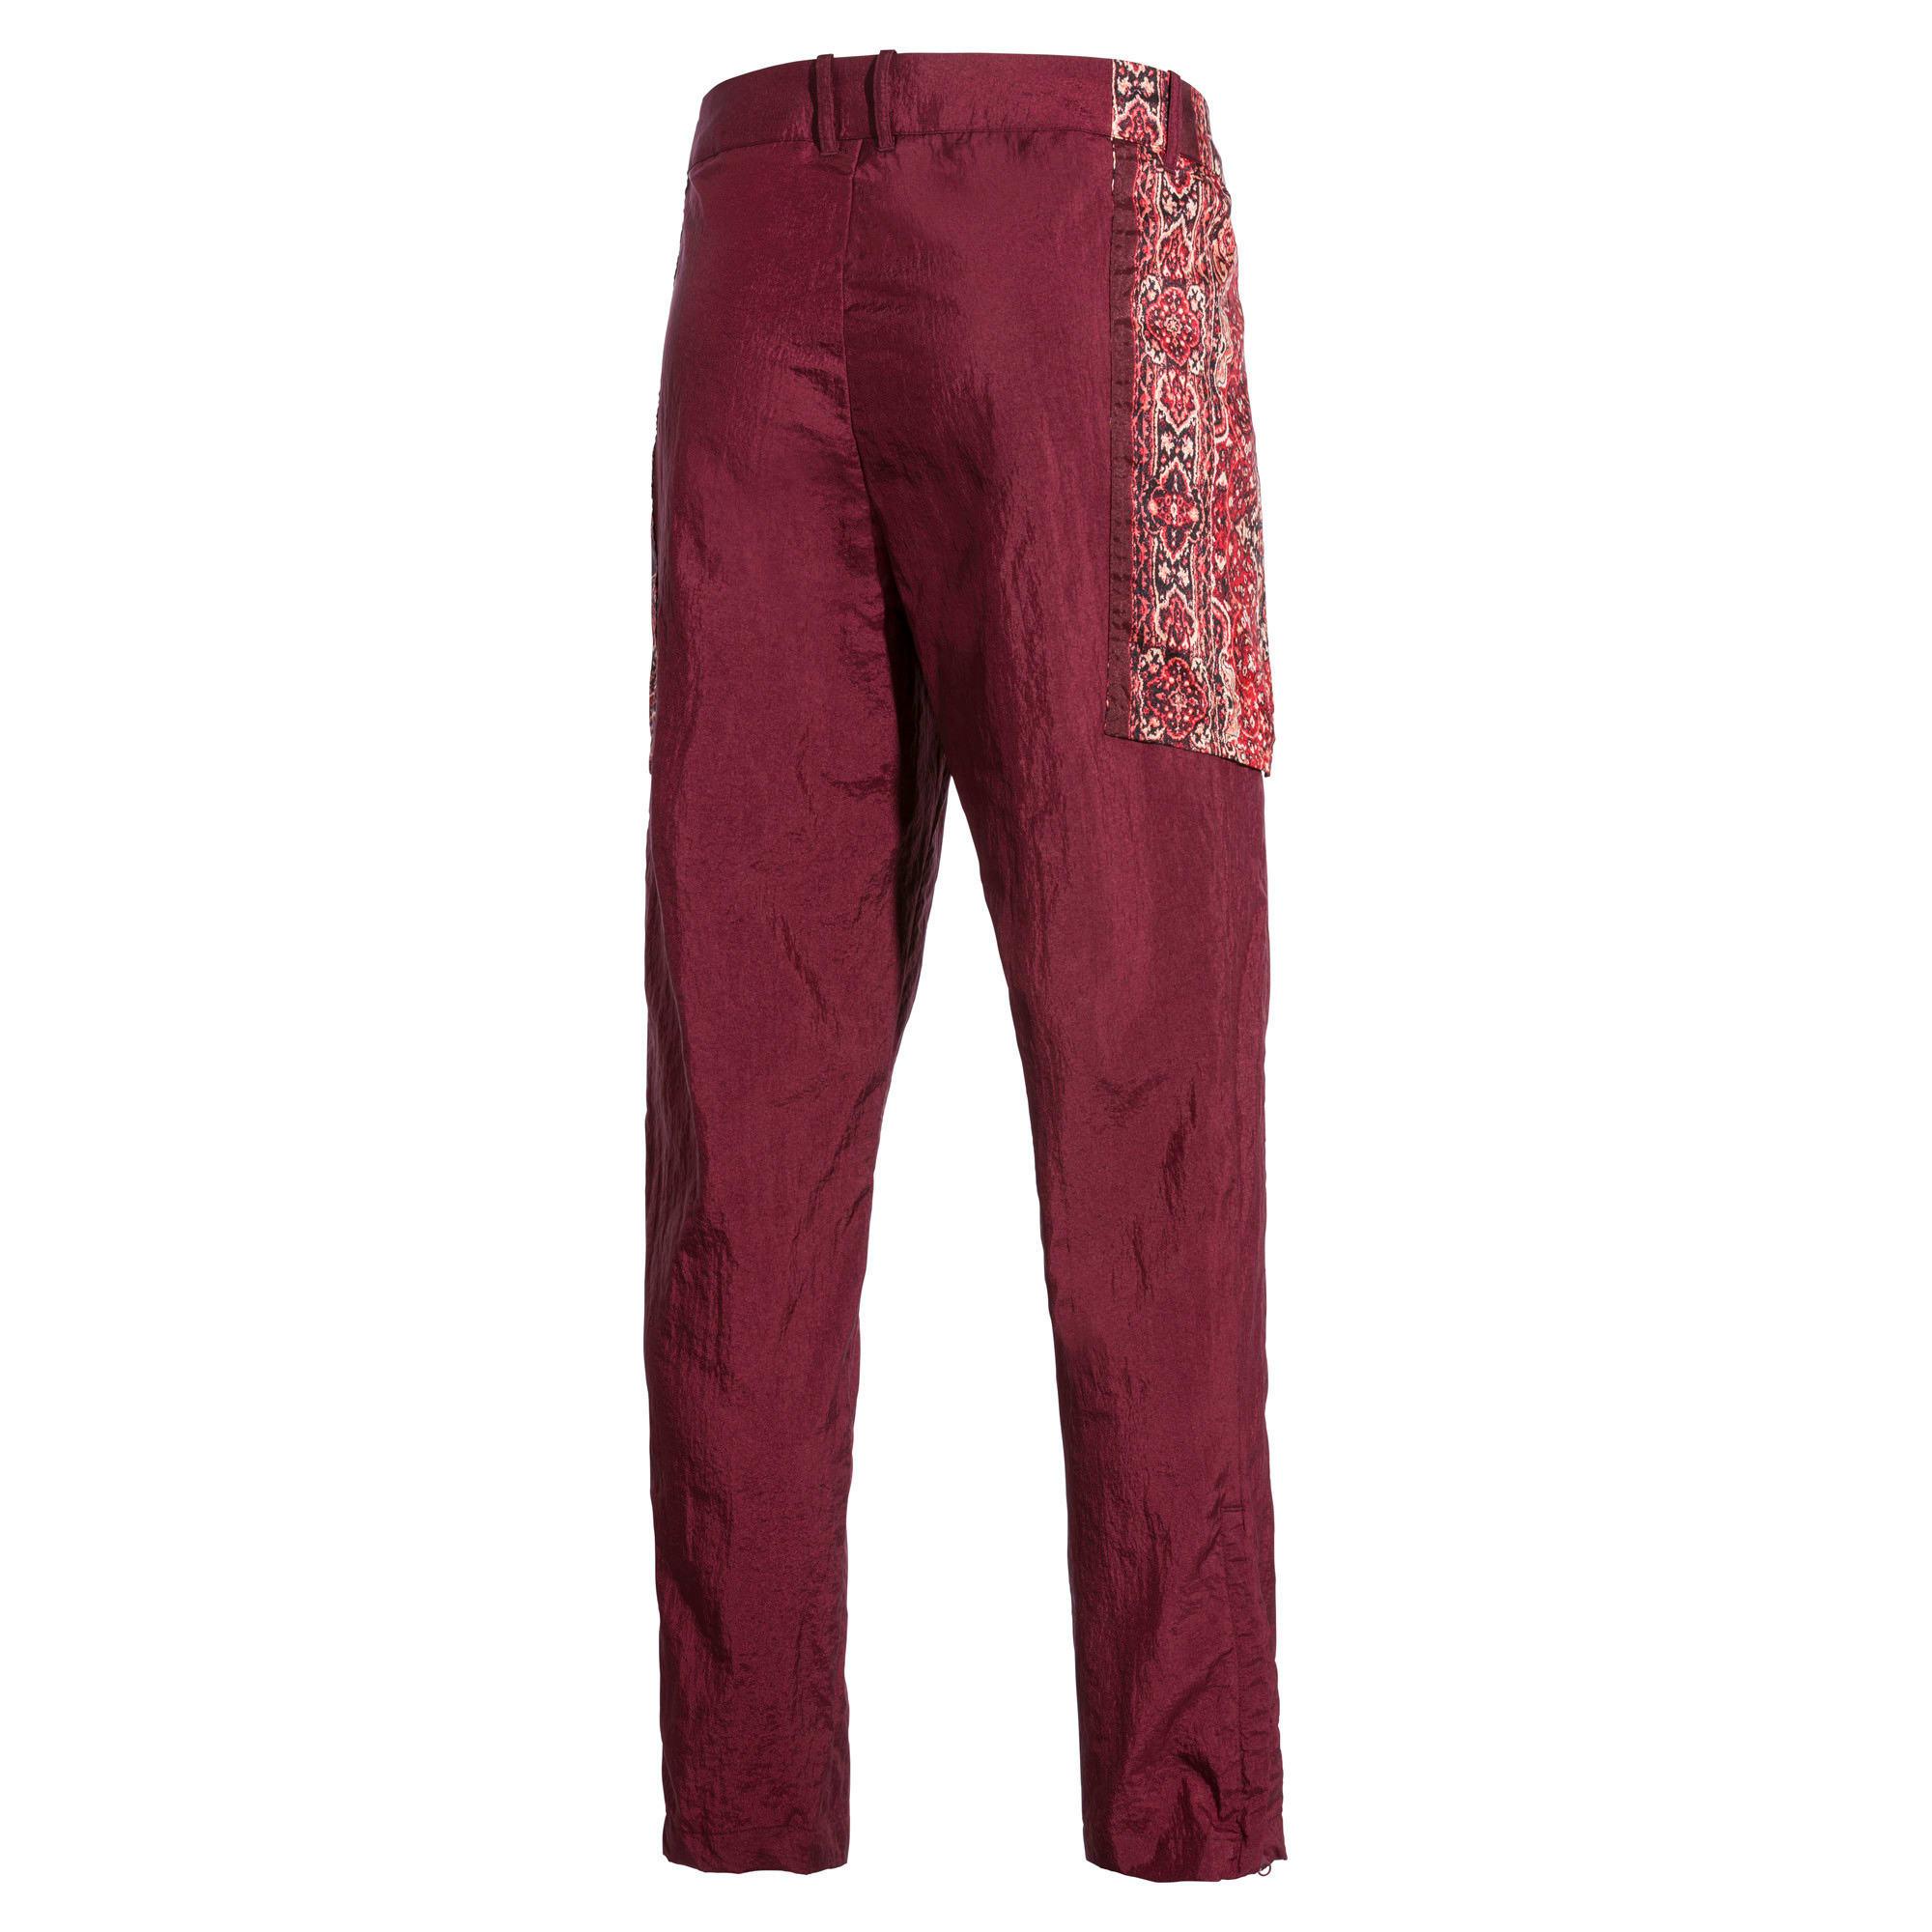 Miniatura 6 de Pantalones deportivos PUMA x LES BENJAMINS para hombre, Burgundy, mediano